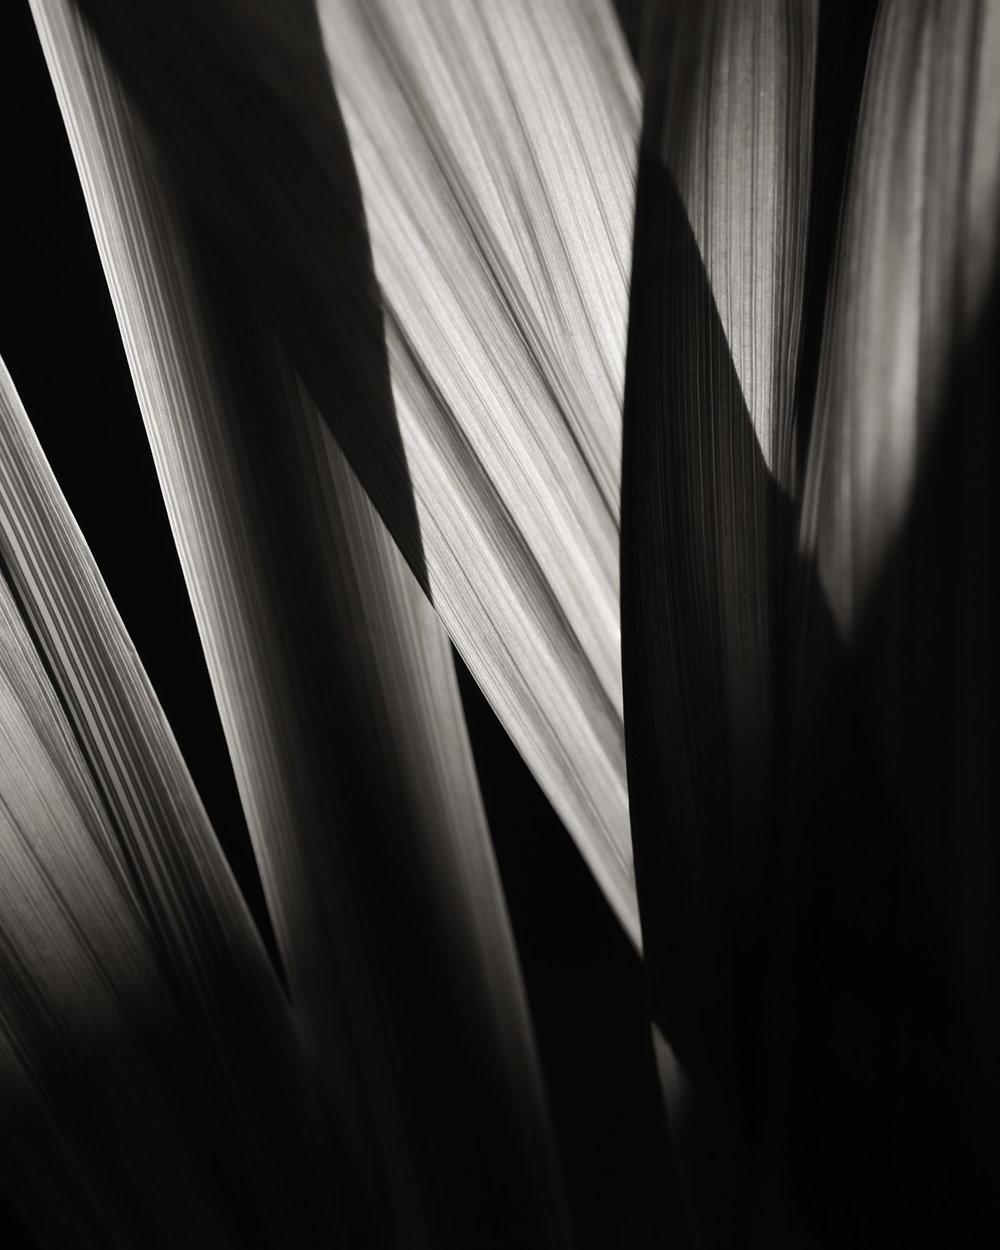 3 Iris Leaves 3 Abstract Interior Design M Decor - affordable art